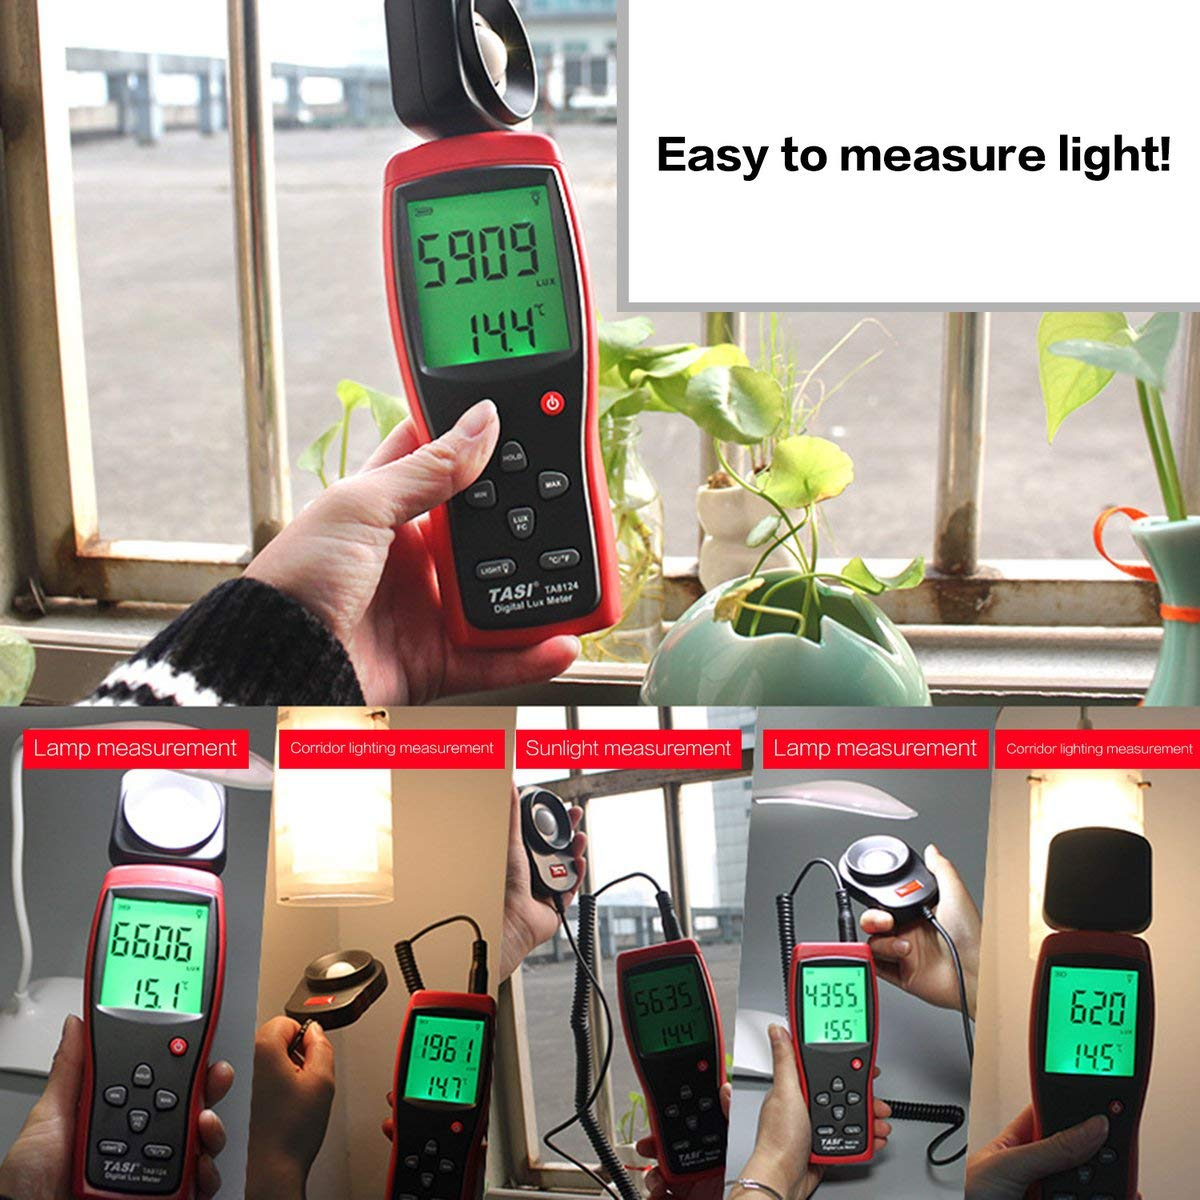 Gugutogo Ta8134 Digital Luxmeter Illuminometer Illuminometro ad alta precisione con luce rossa